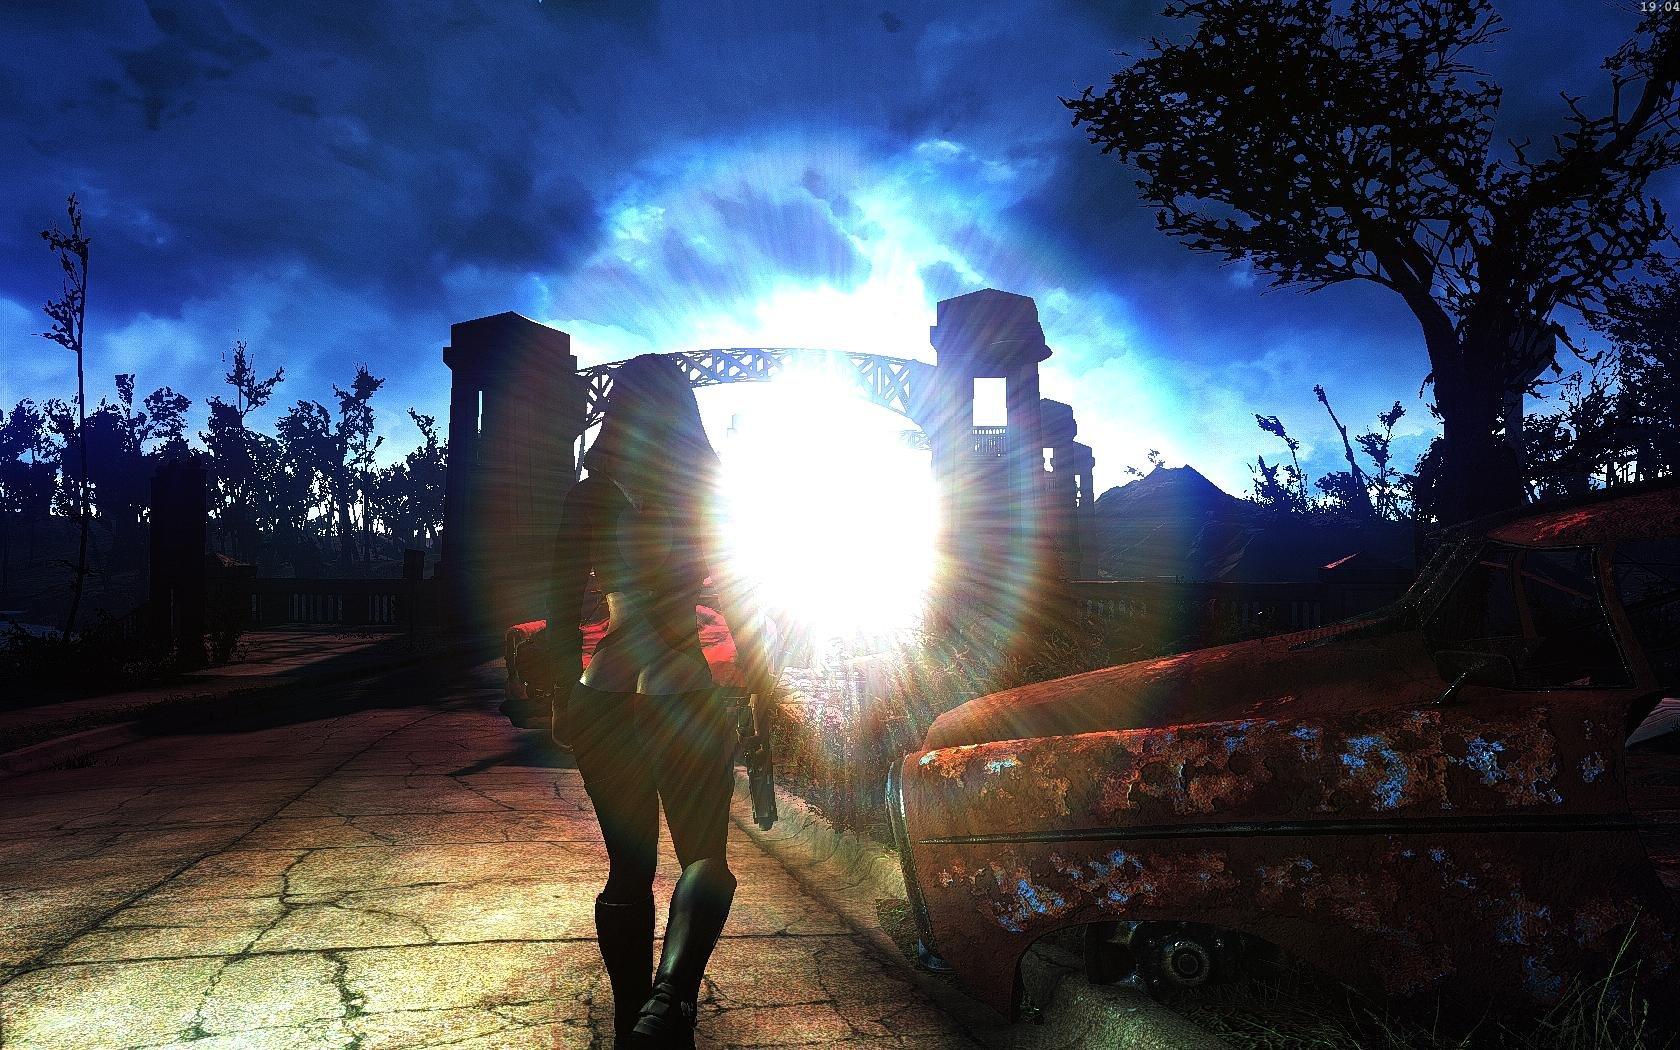 Fallout4 2019-01-15 19-04-22-53